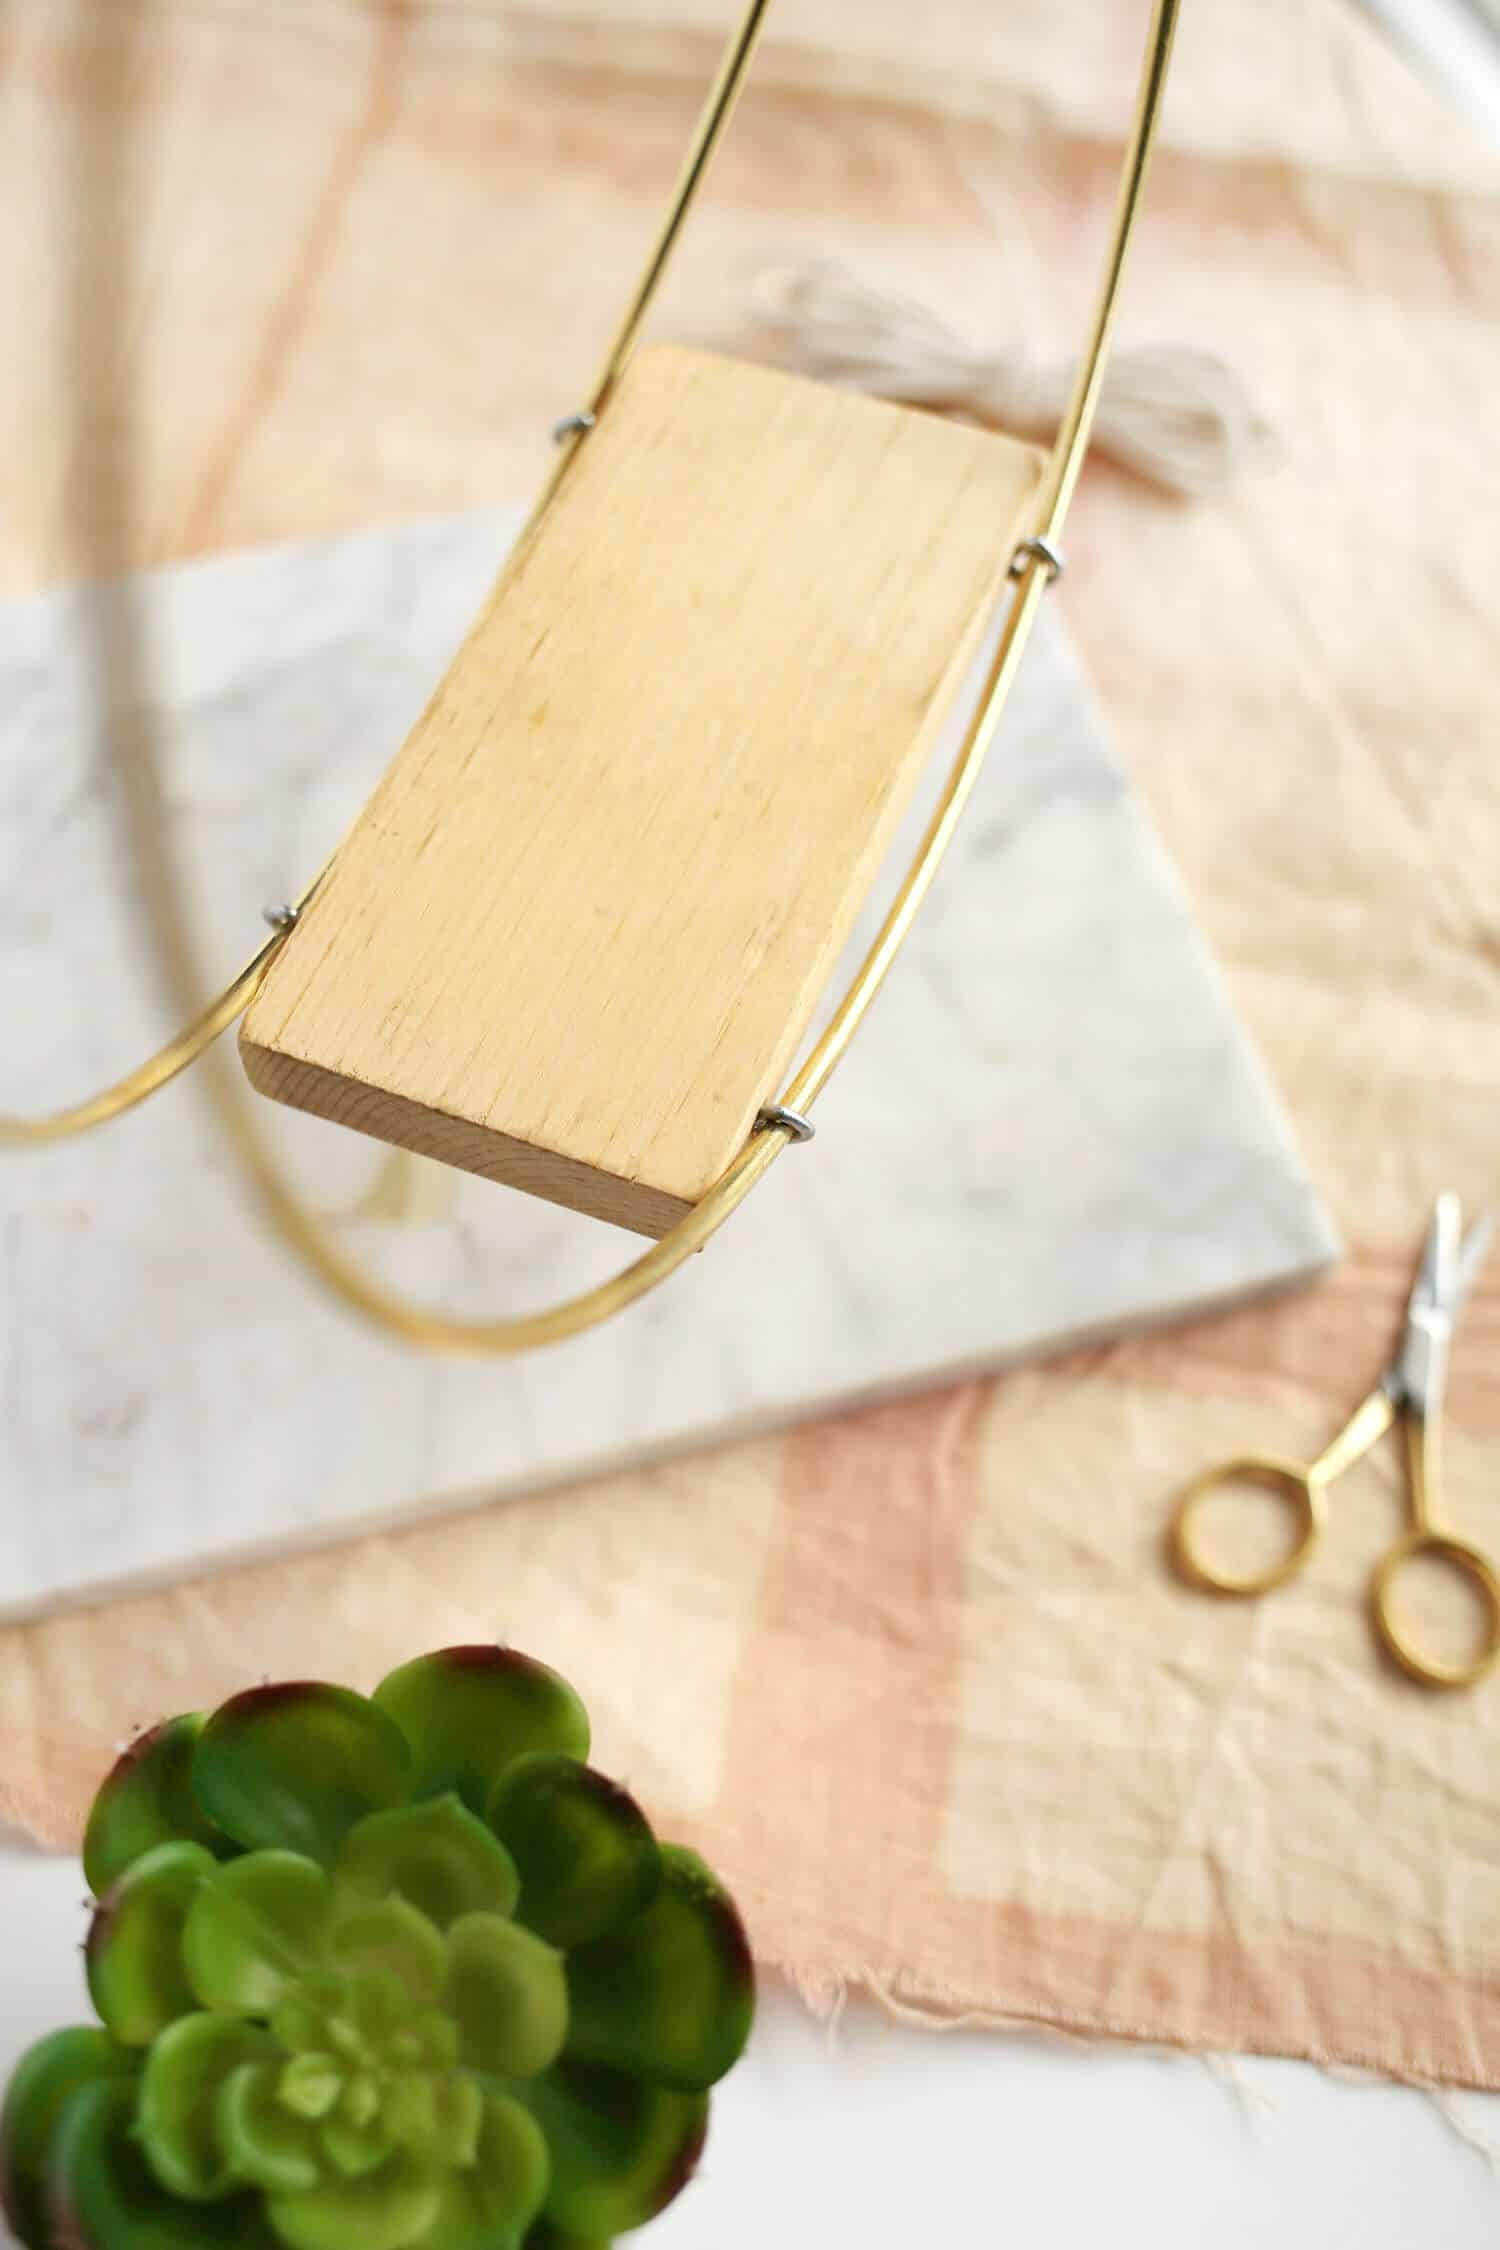 Messingring hängender Pflanzer DIY